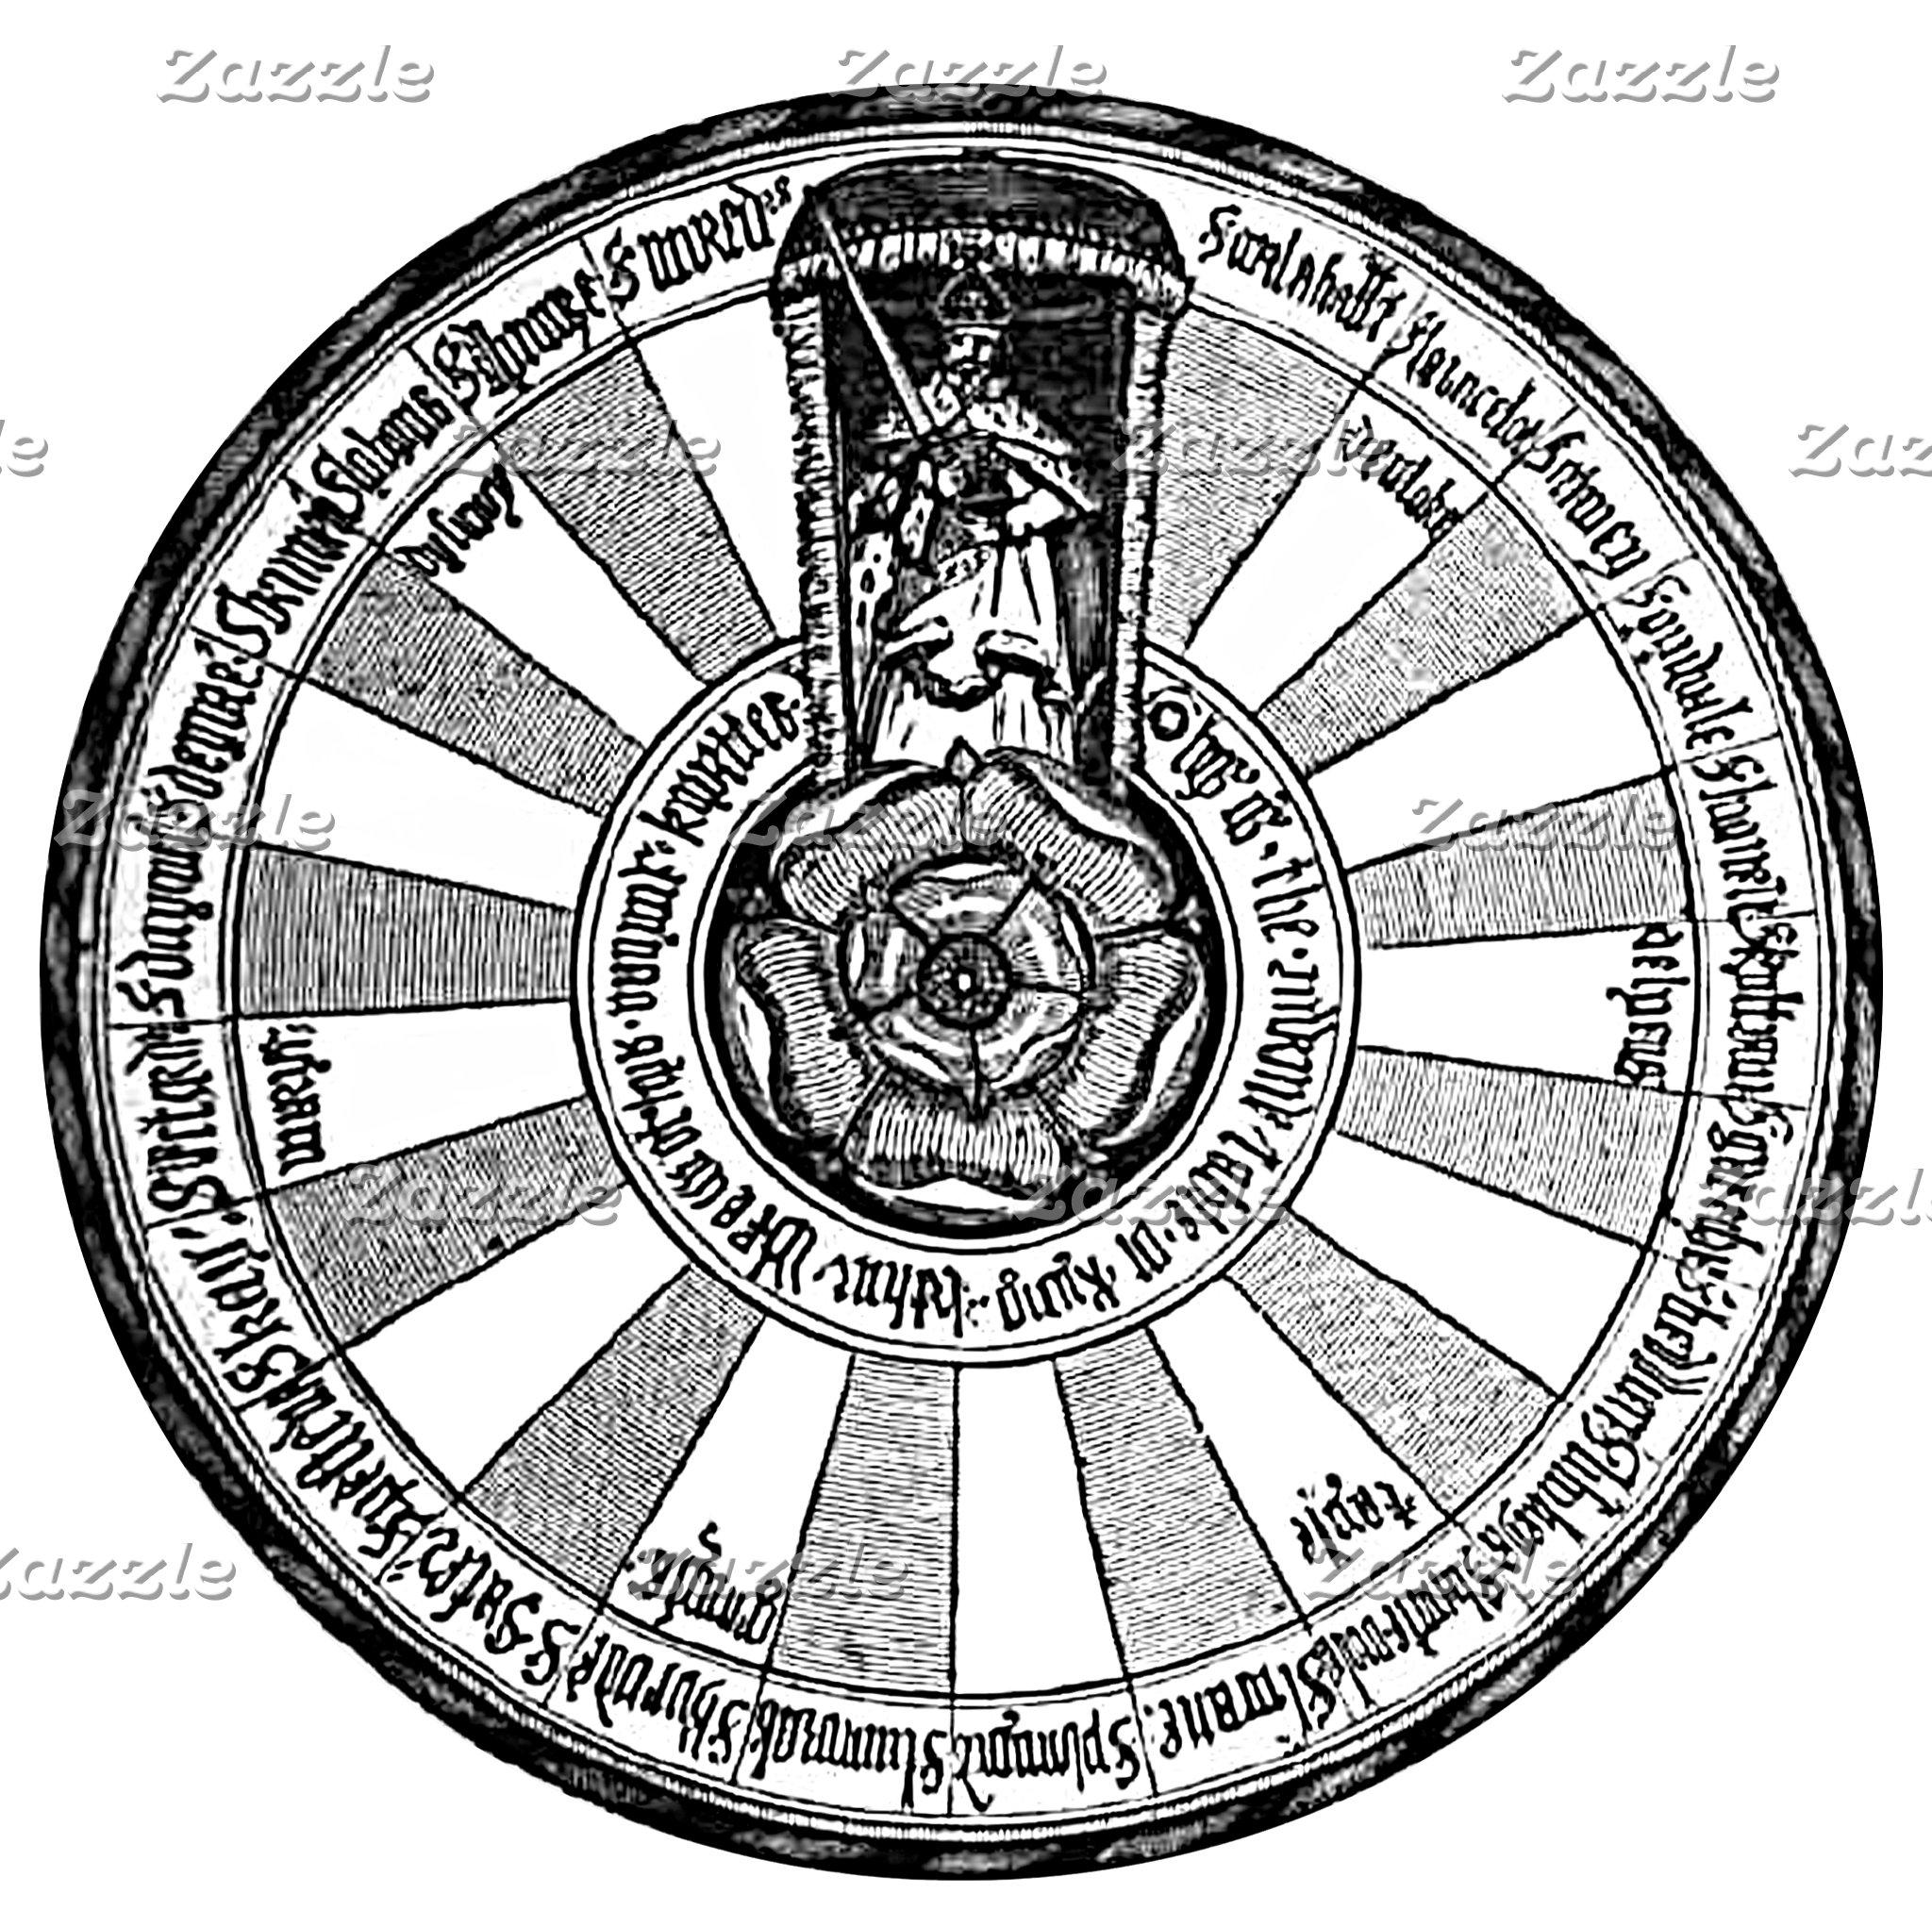 Arthur's round table